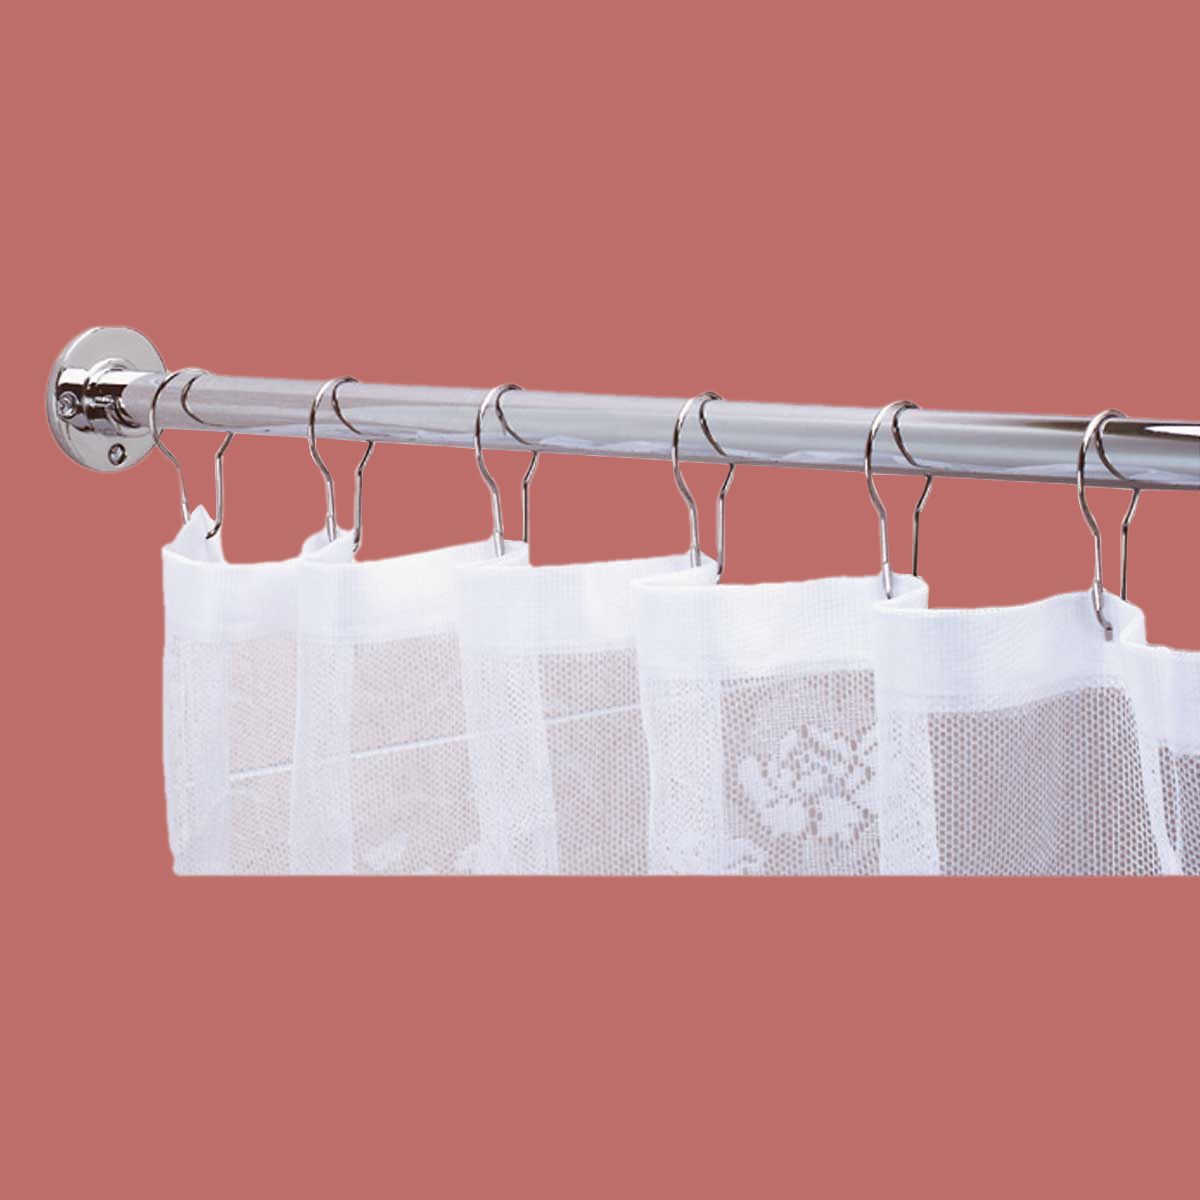 Shower Curtain Rod Bright Chrome 6 Feet Long